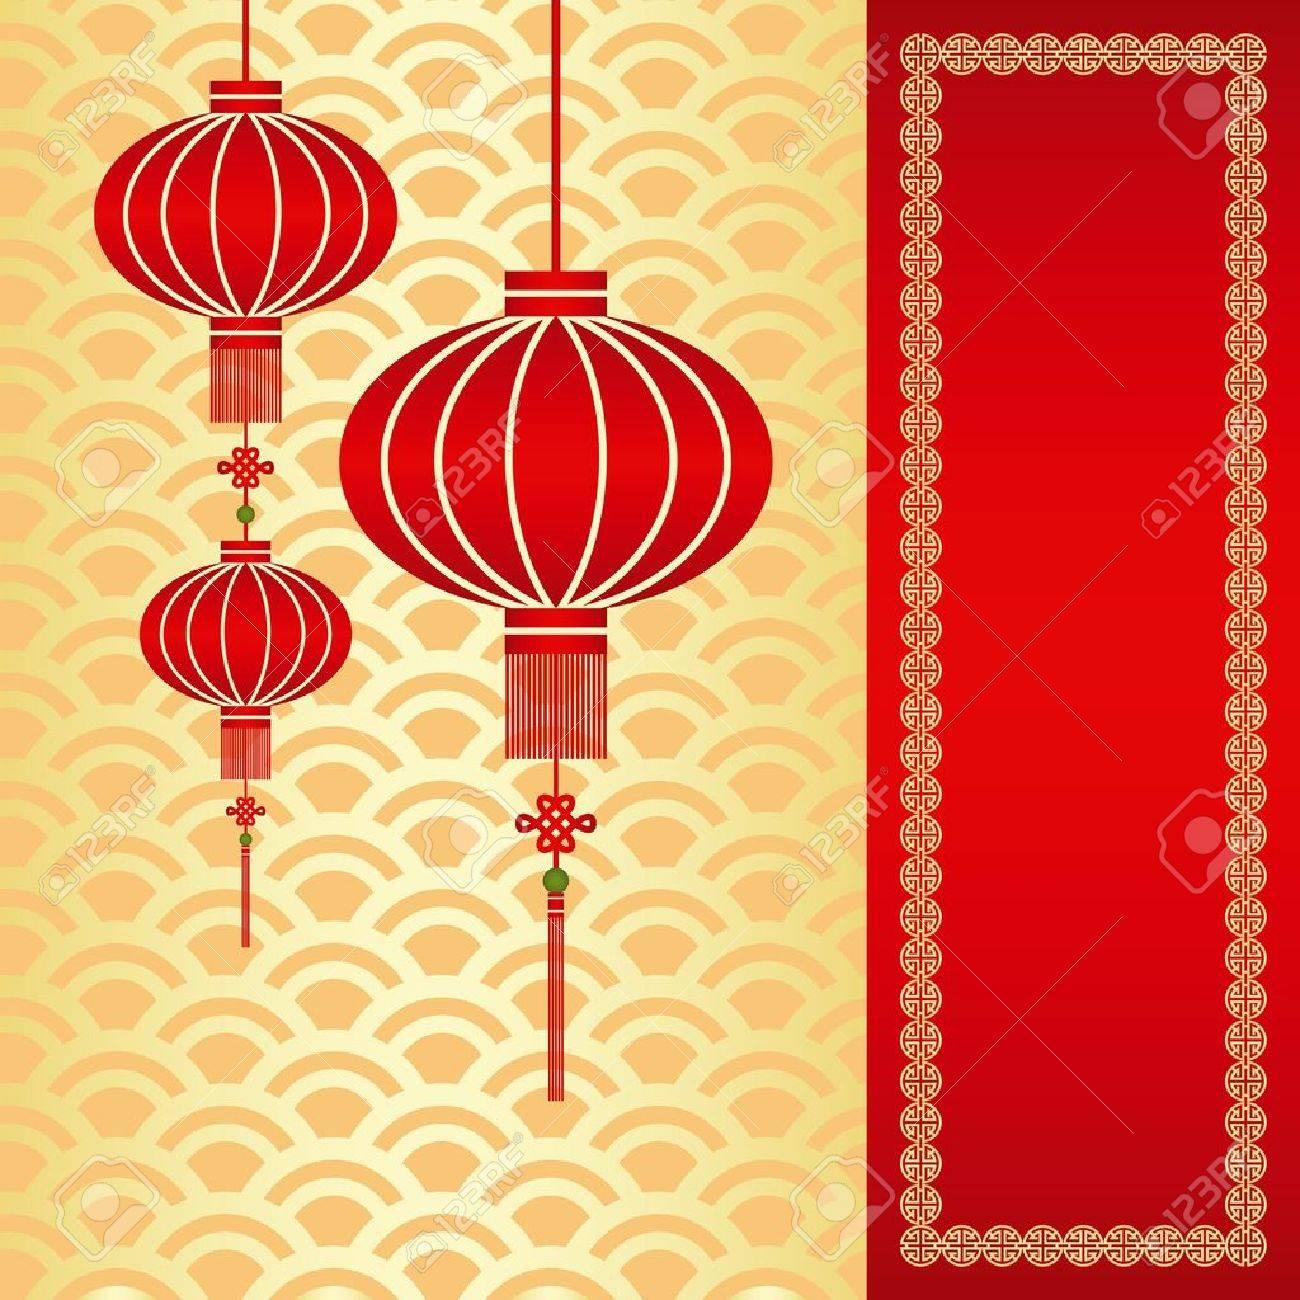 Red chinese lantern on seamless pattern background - 11531028